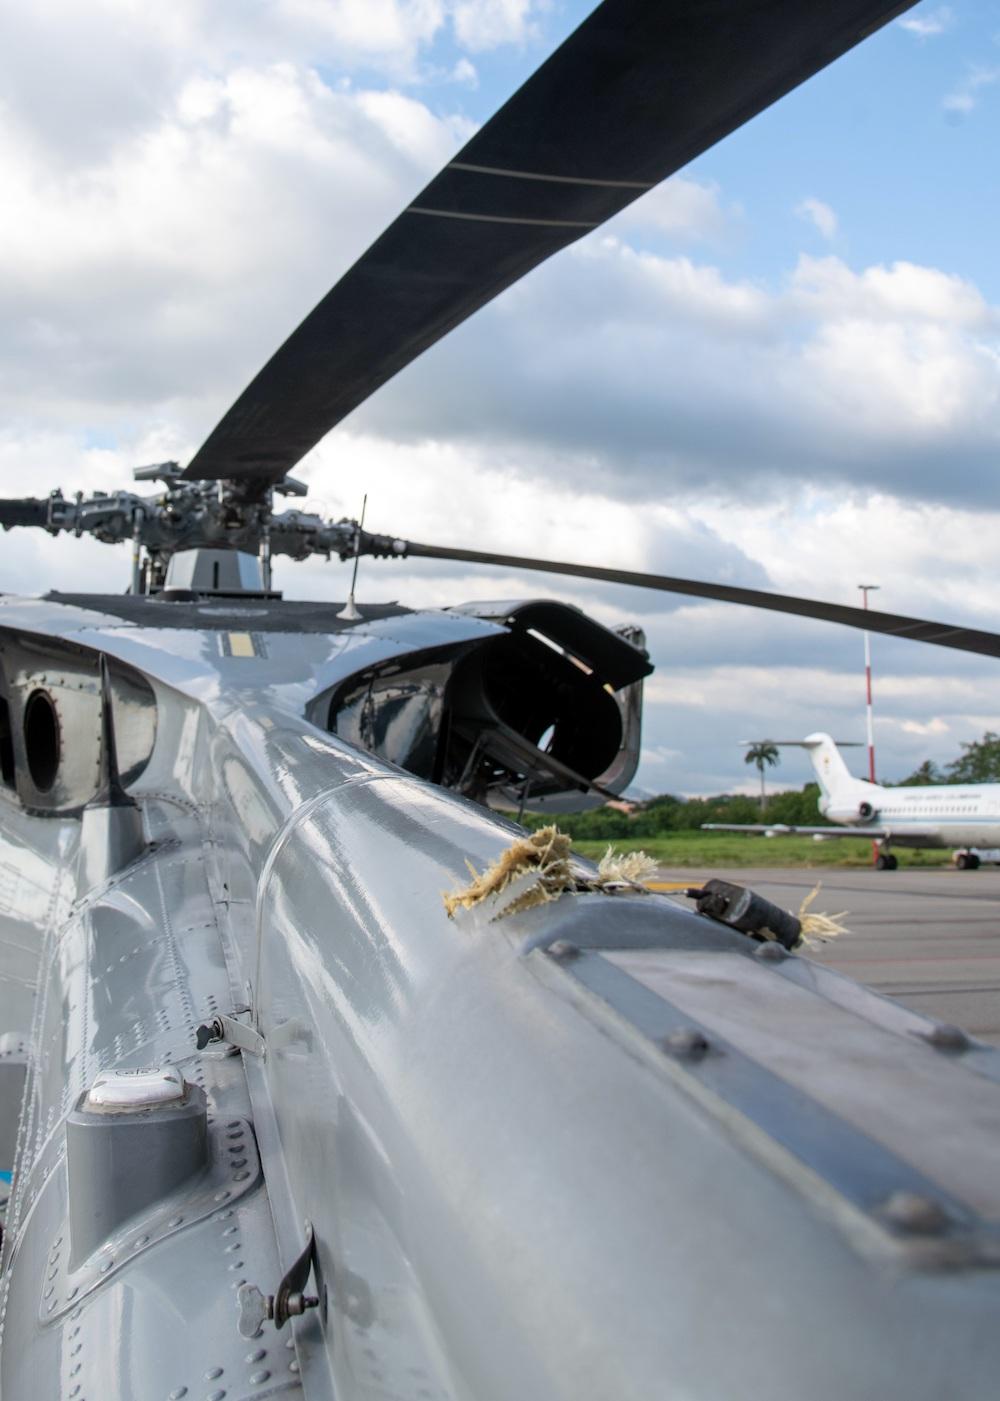 В Колумбии обстреляли вертолет с президентом и министрами: фото, видео